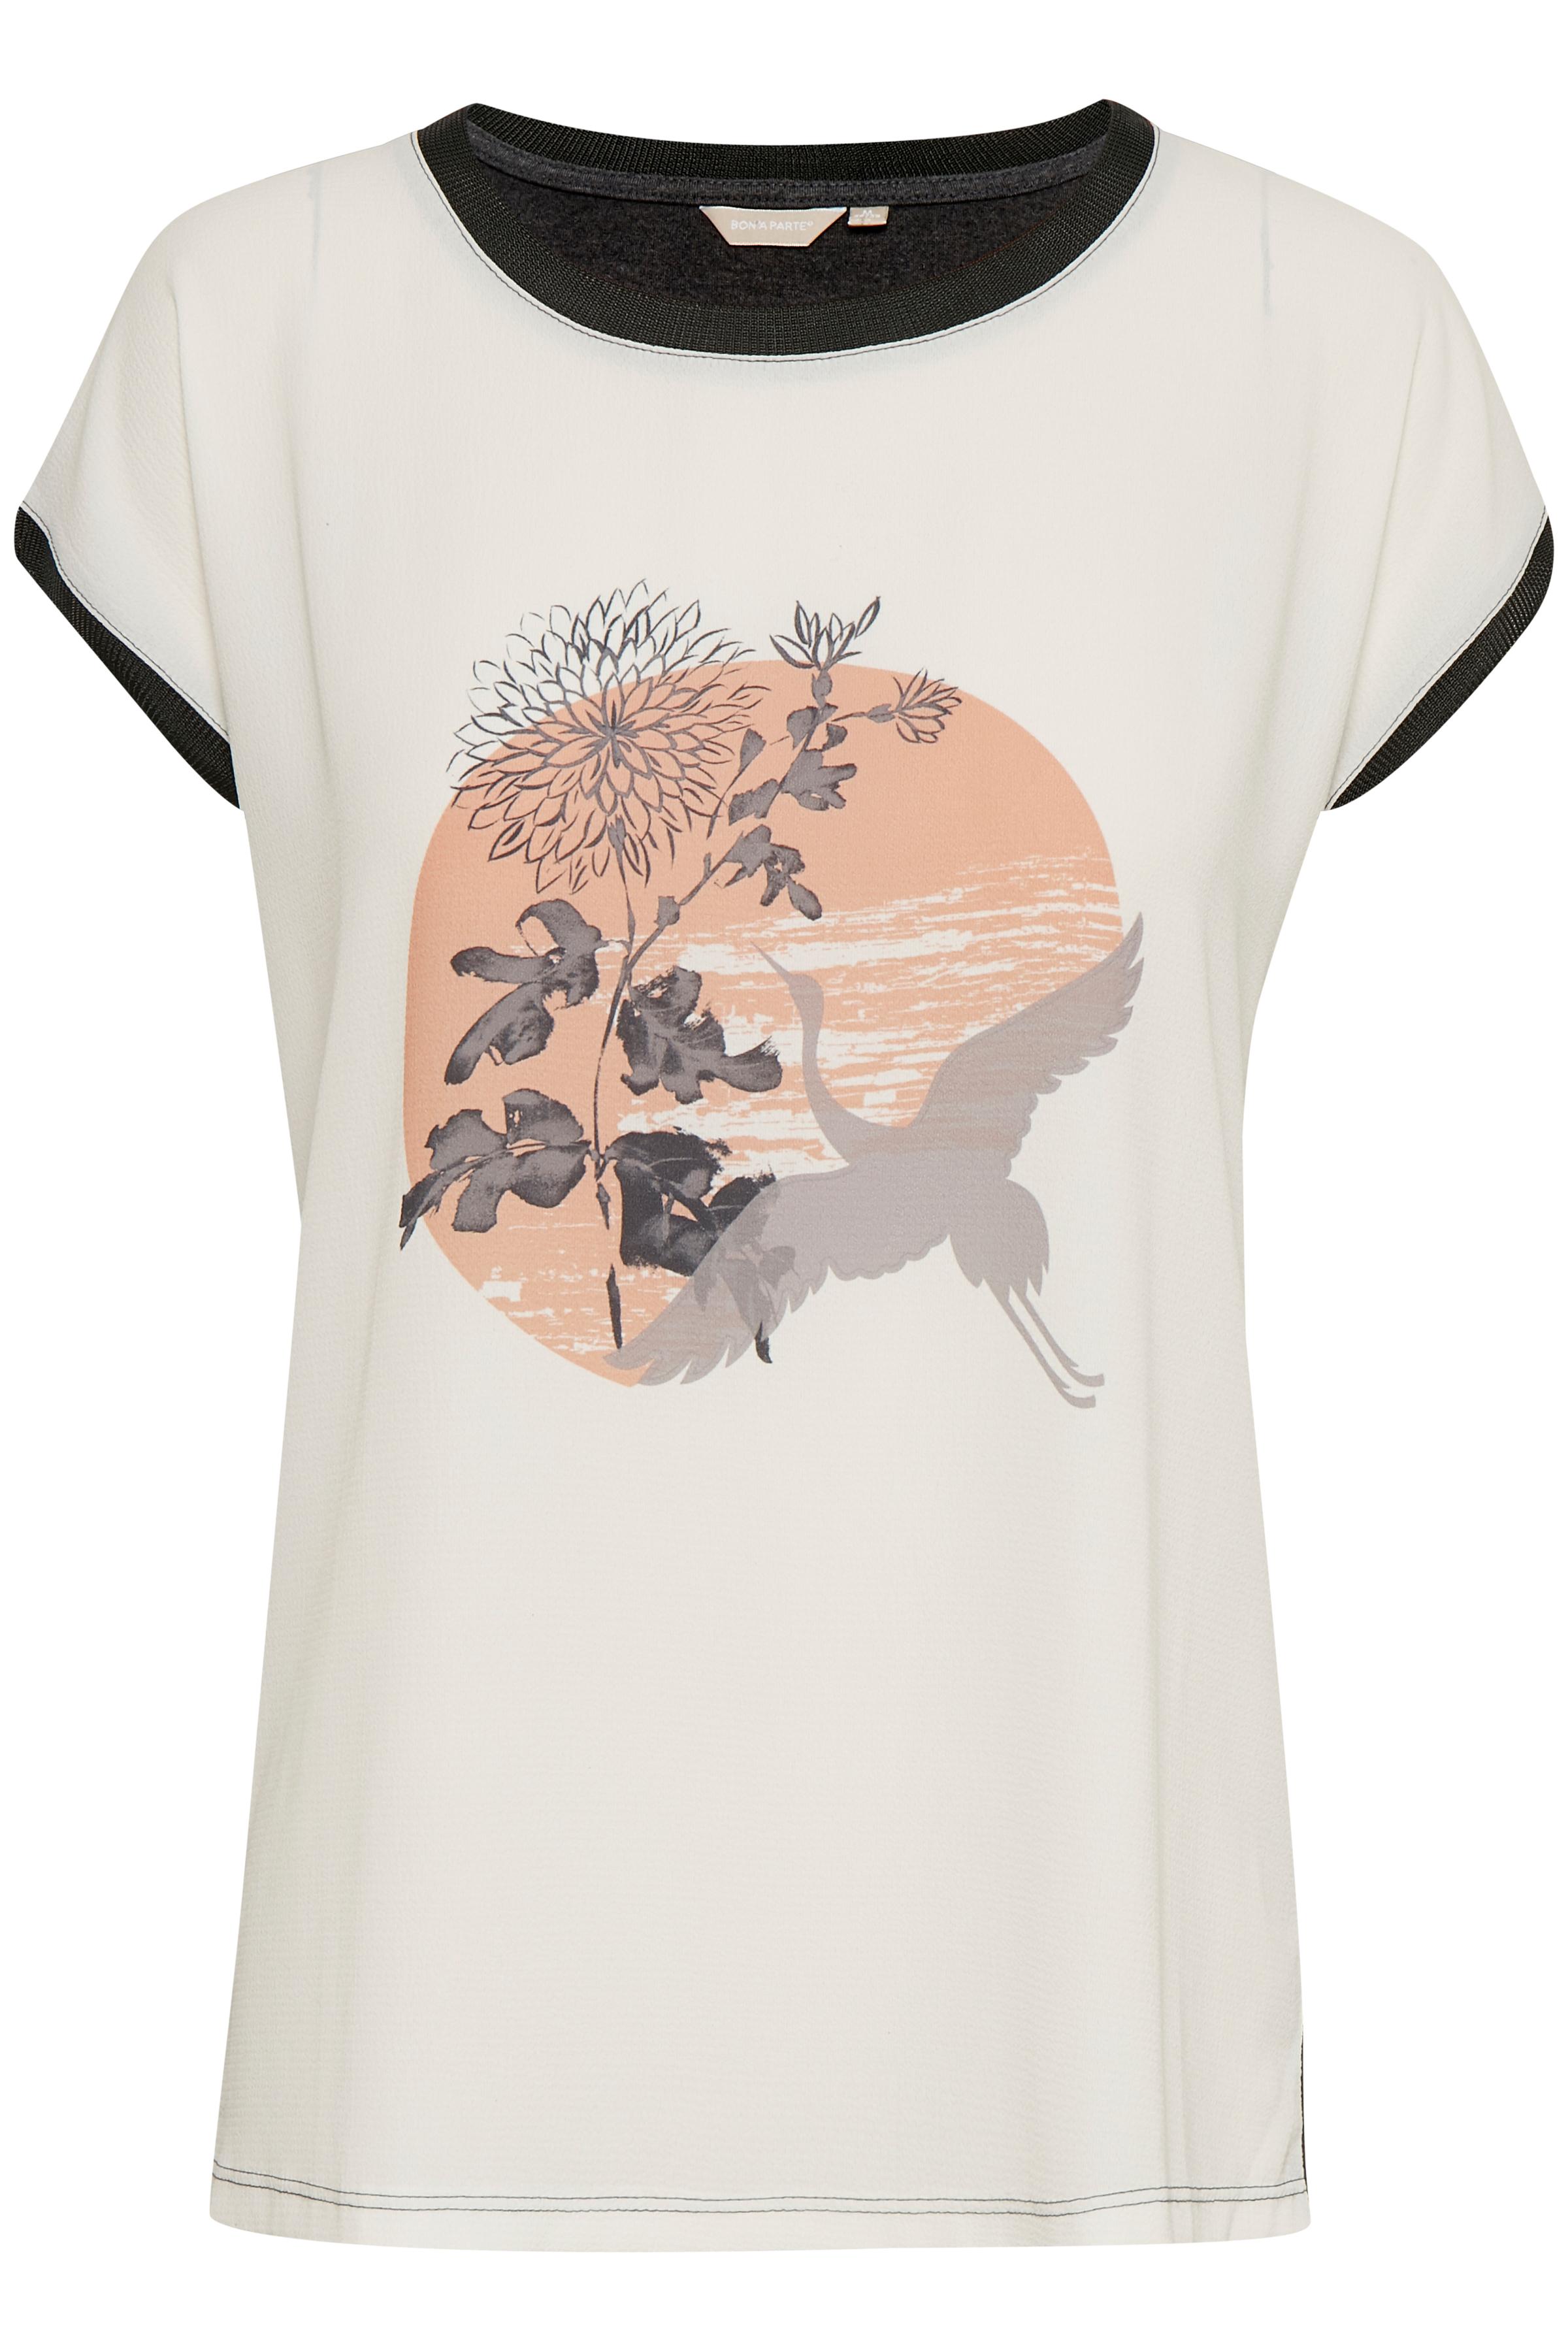 Wollweiß/dunkelgrau Kurzarm-Bluse von Bon'A Parte – Shoppen Sie Wollweiß/dunkelgrau Kurzarm-Bluse ab Gr. S-2XL hier